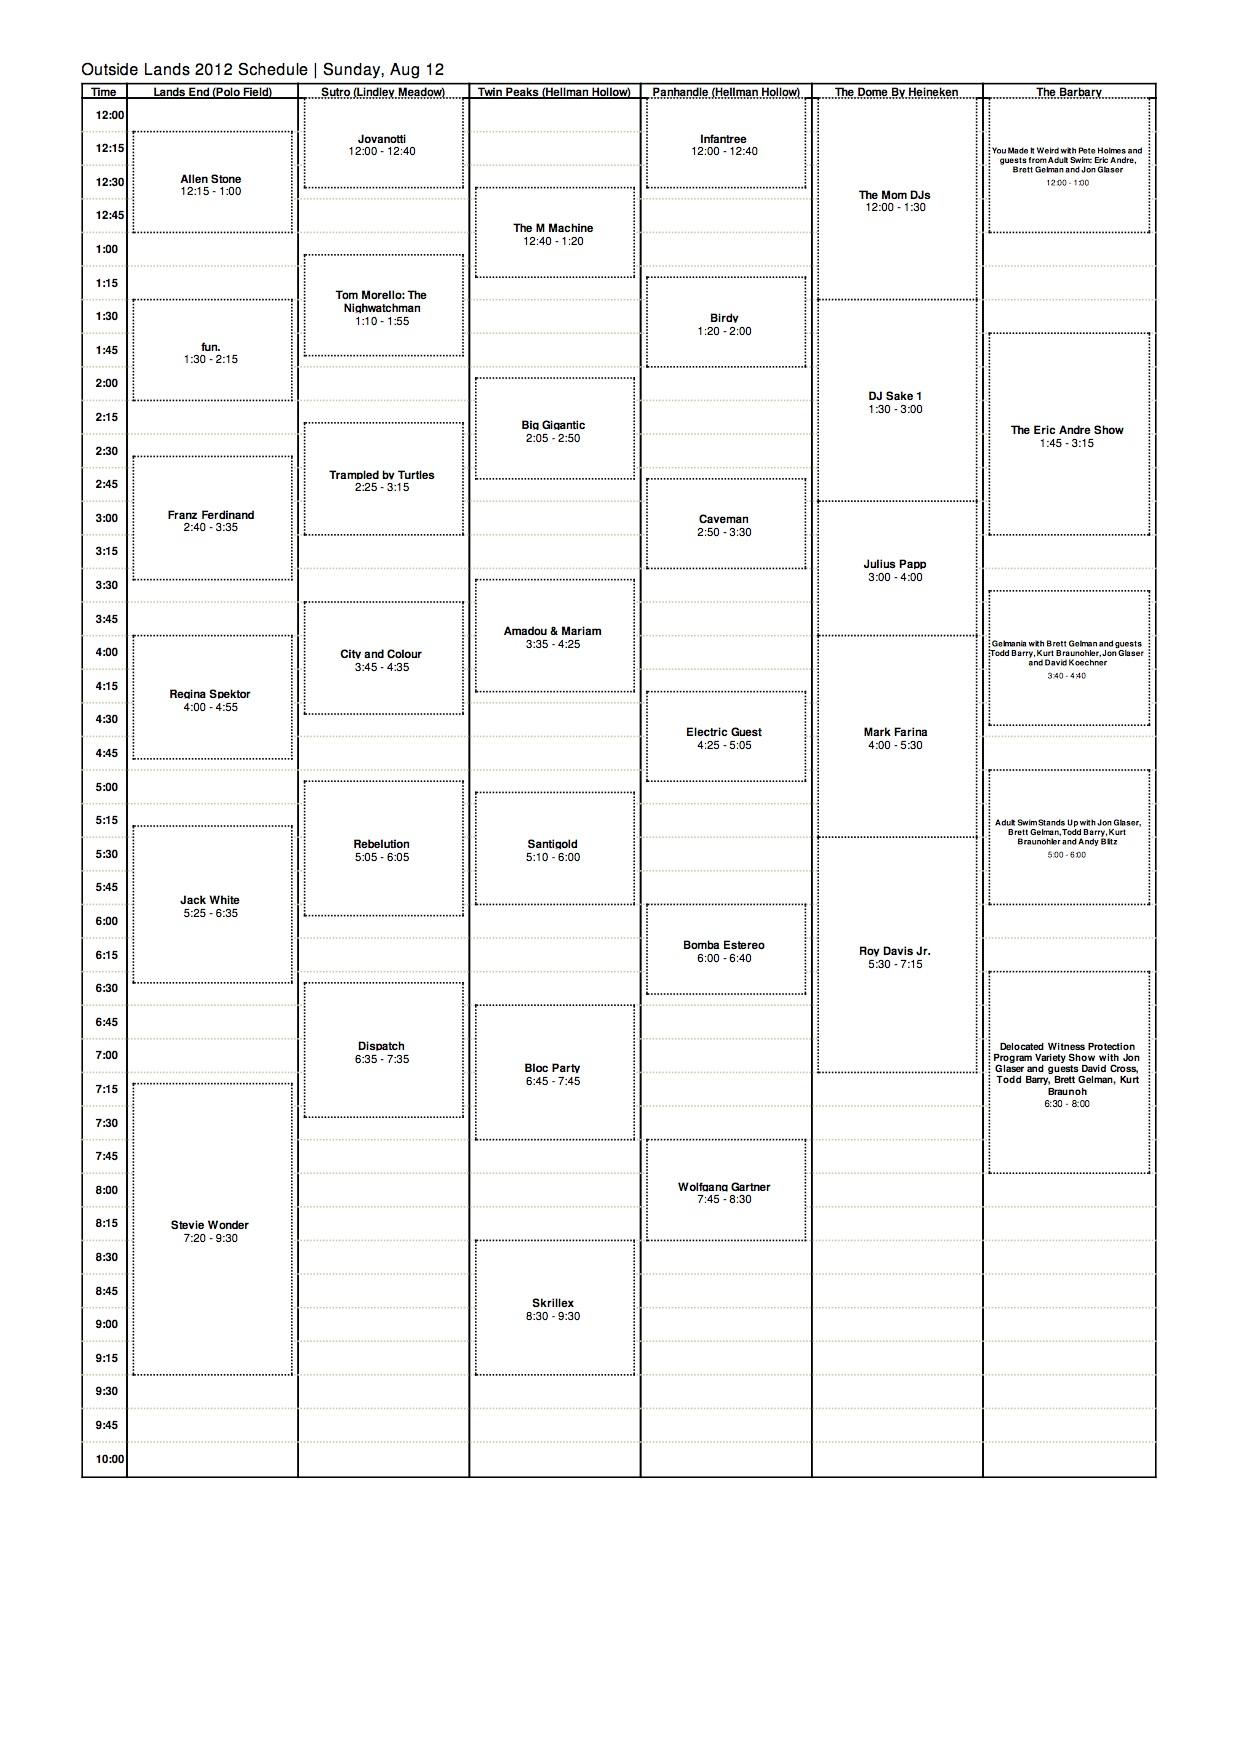 osl sun 2012 Outside Lands reveals 2012 schedule